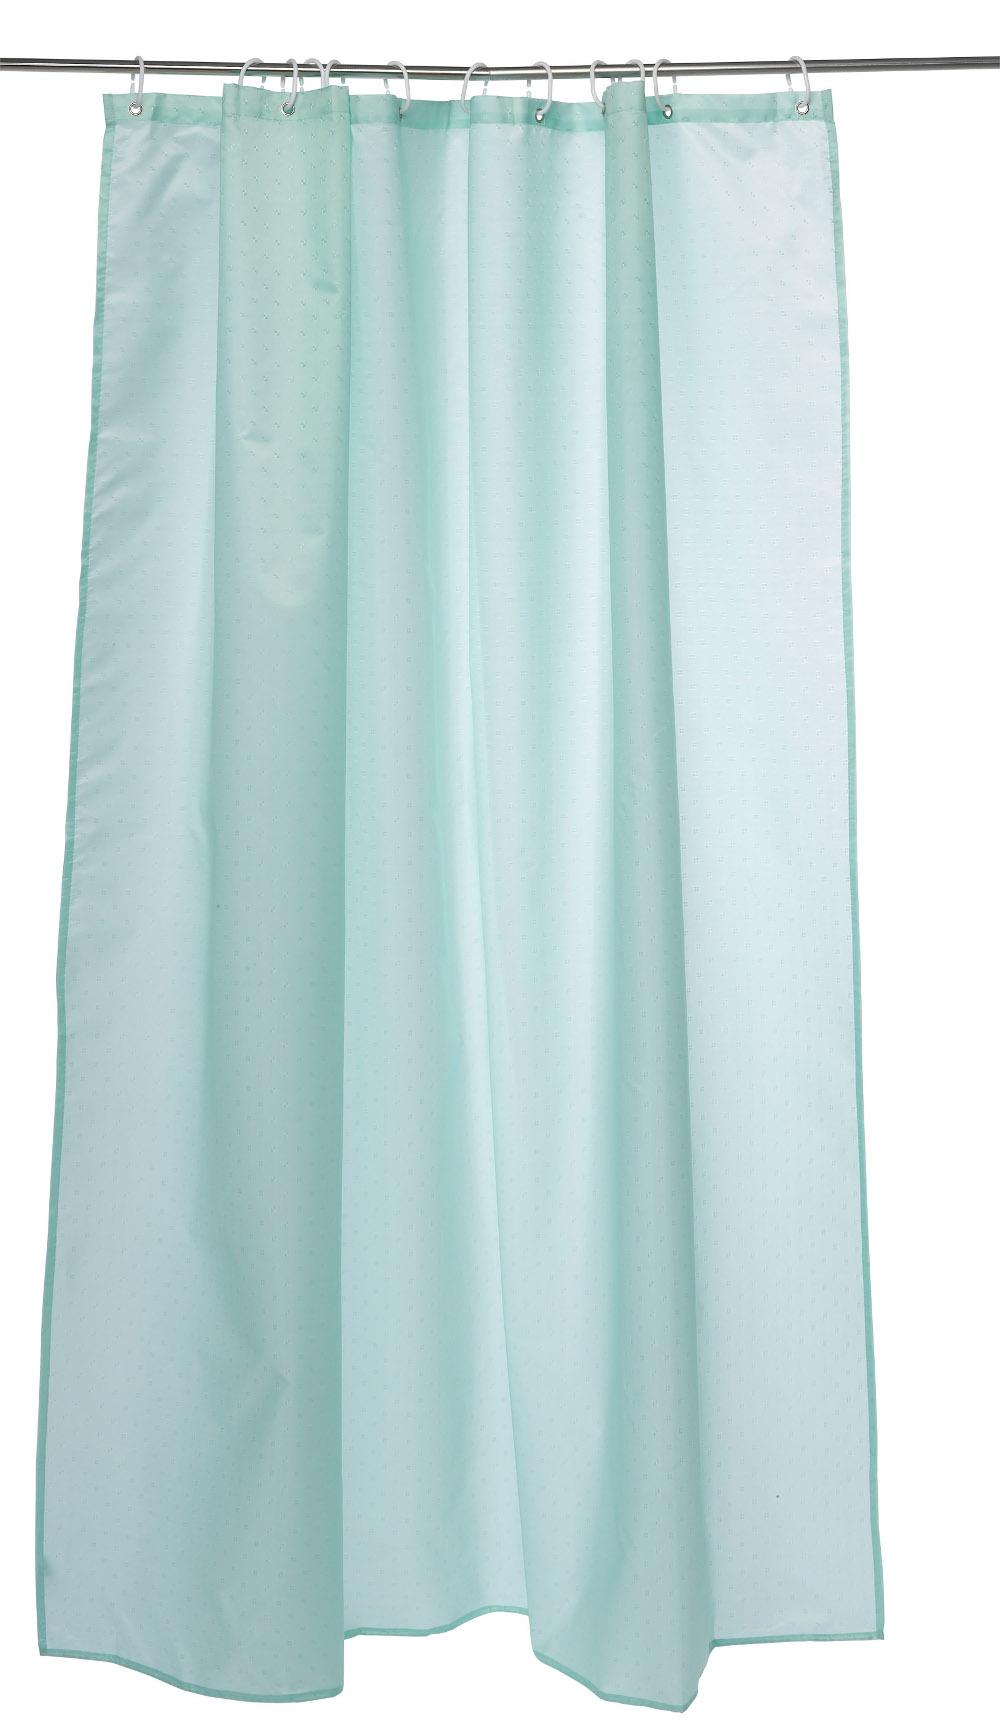 Waterproof Bathroom Shower Curtains Hooks 180cm X 180cm Weighted Splash Proof Ebay